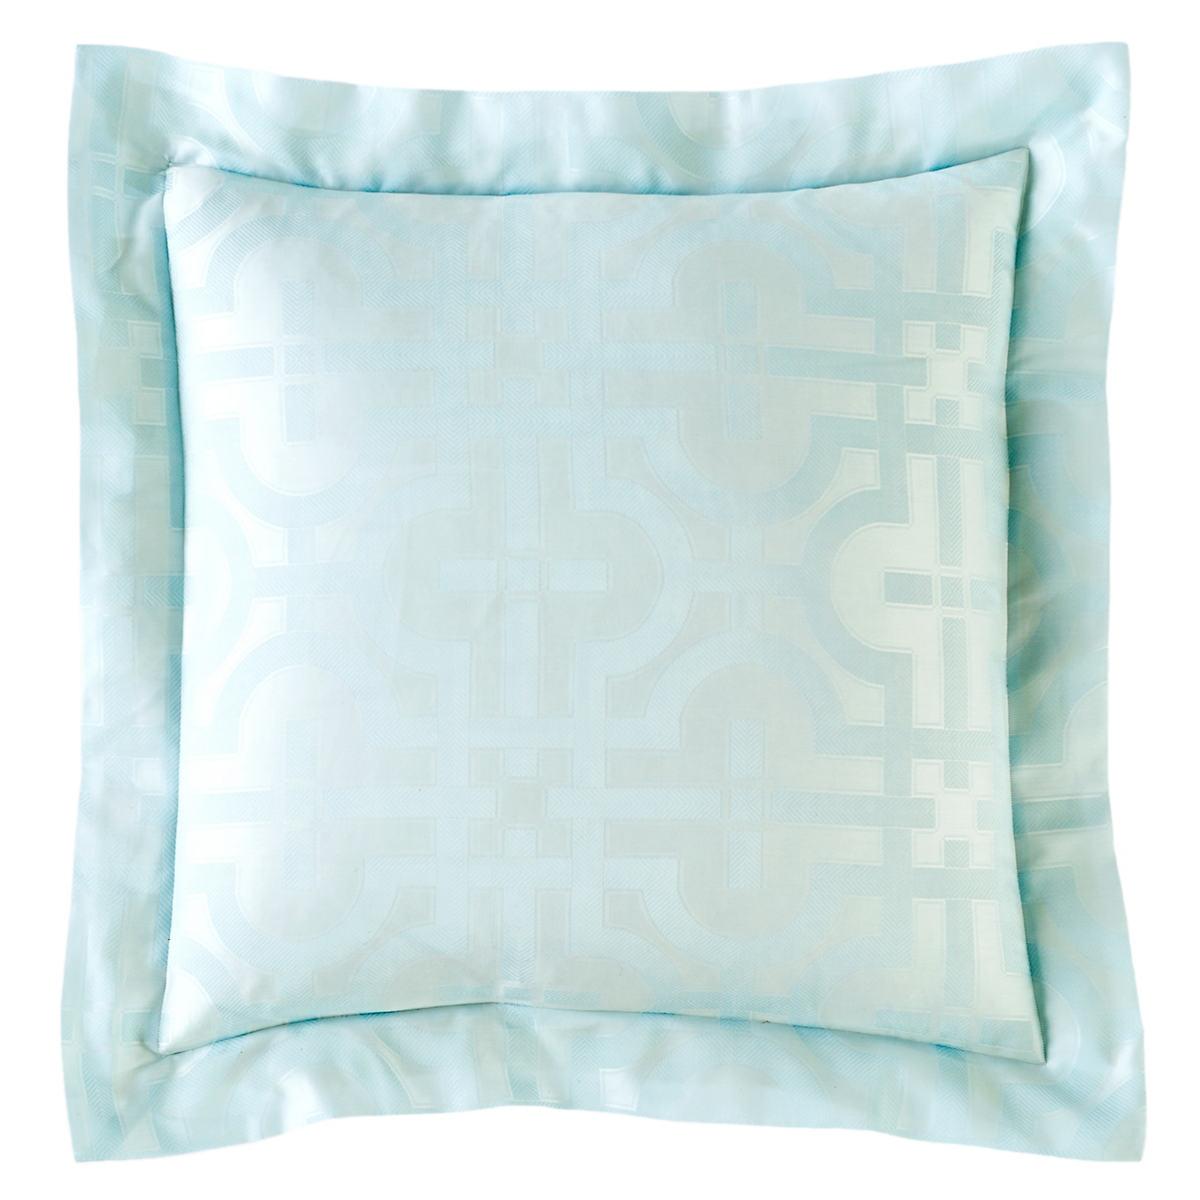 Nodo Pearl Blue Sham